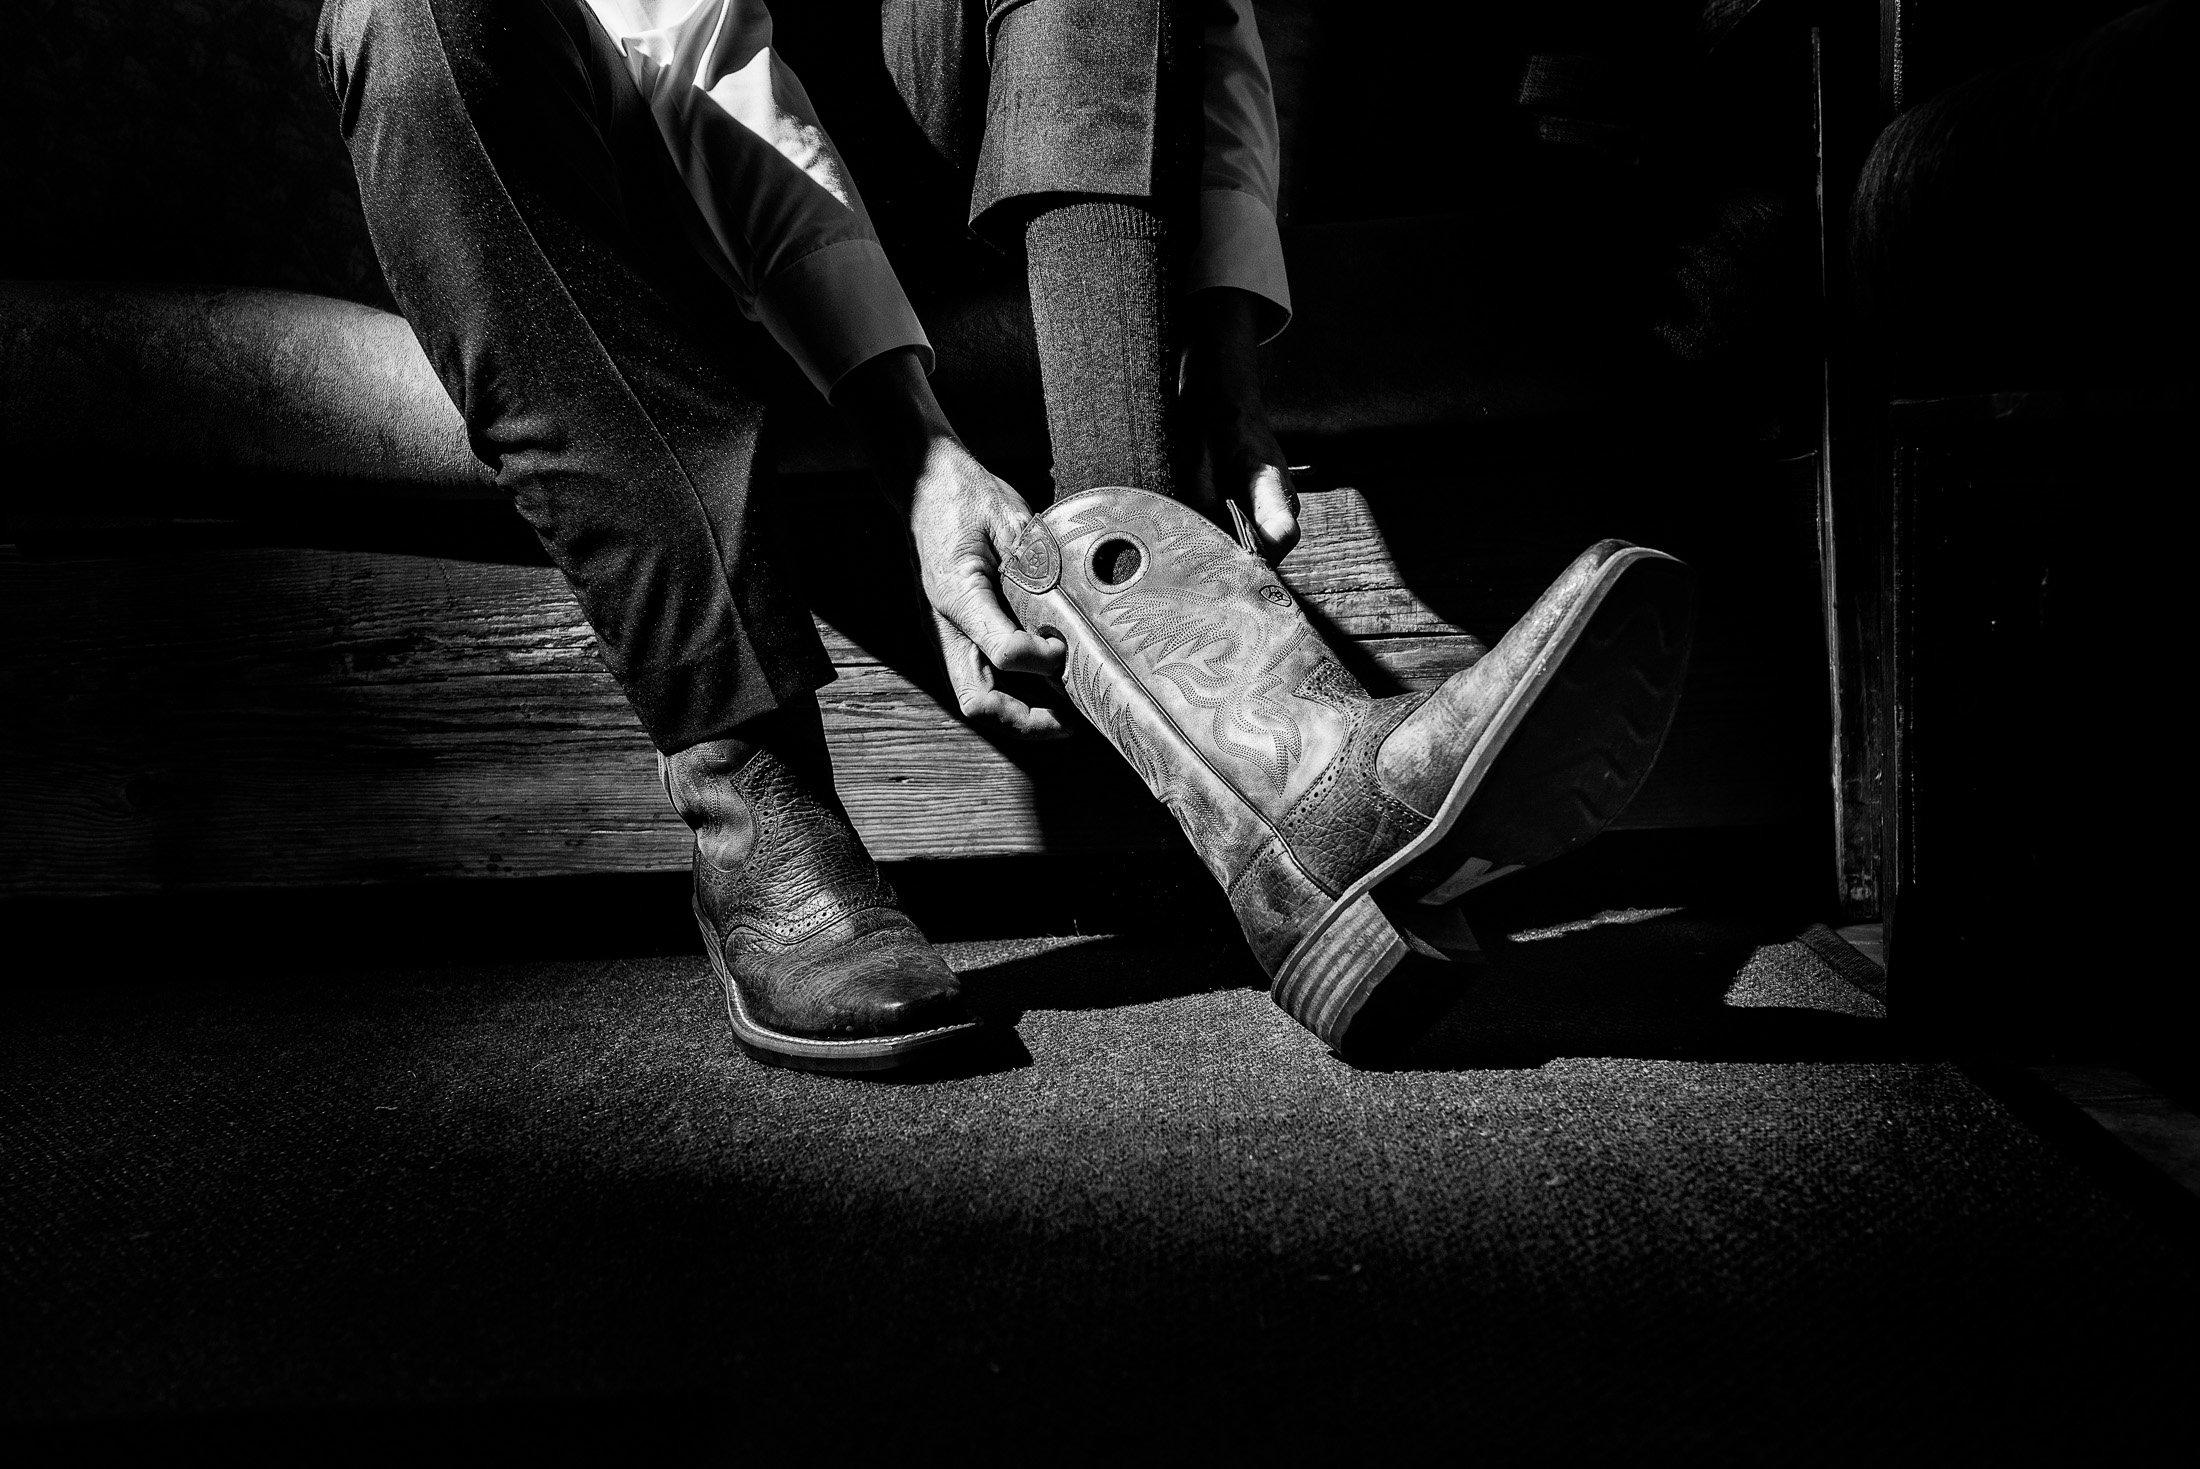 001 cowboy boots wedding